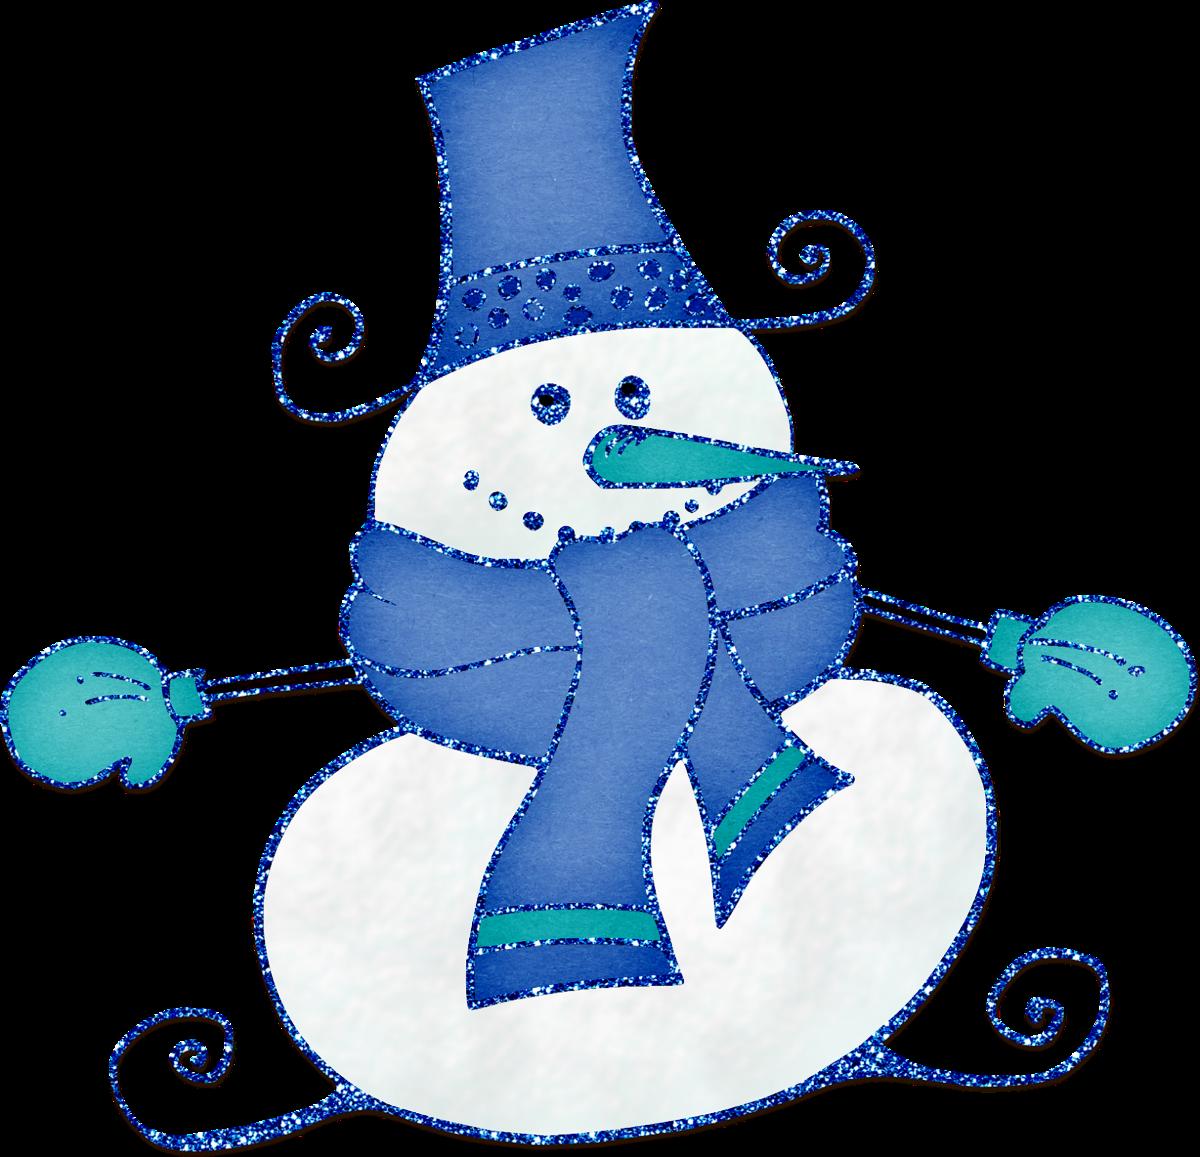 решили картинка символами зима гусеница, превращаясь куколку